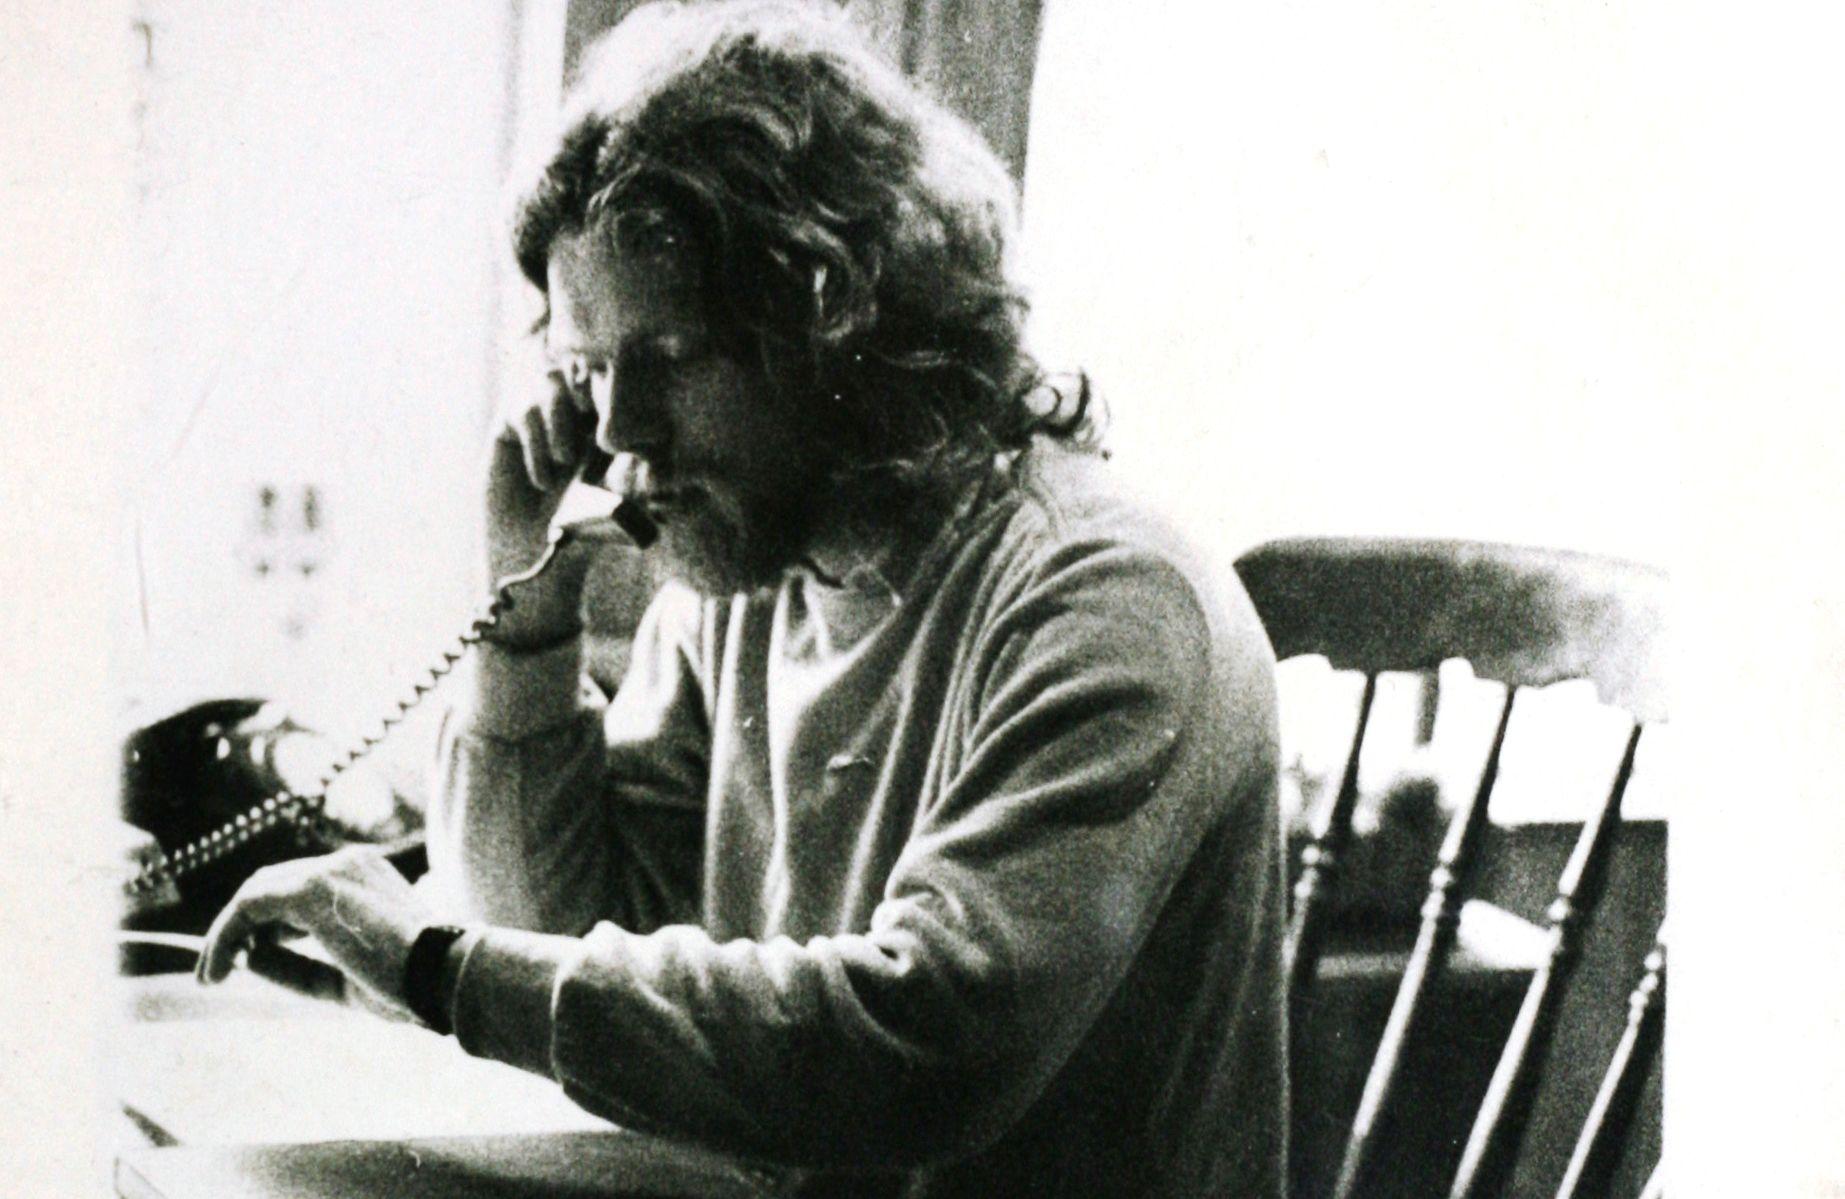 Richard Branson working early days